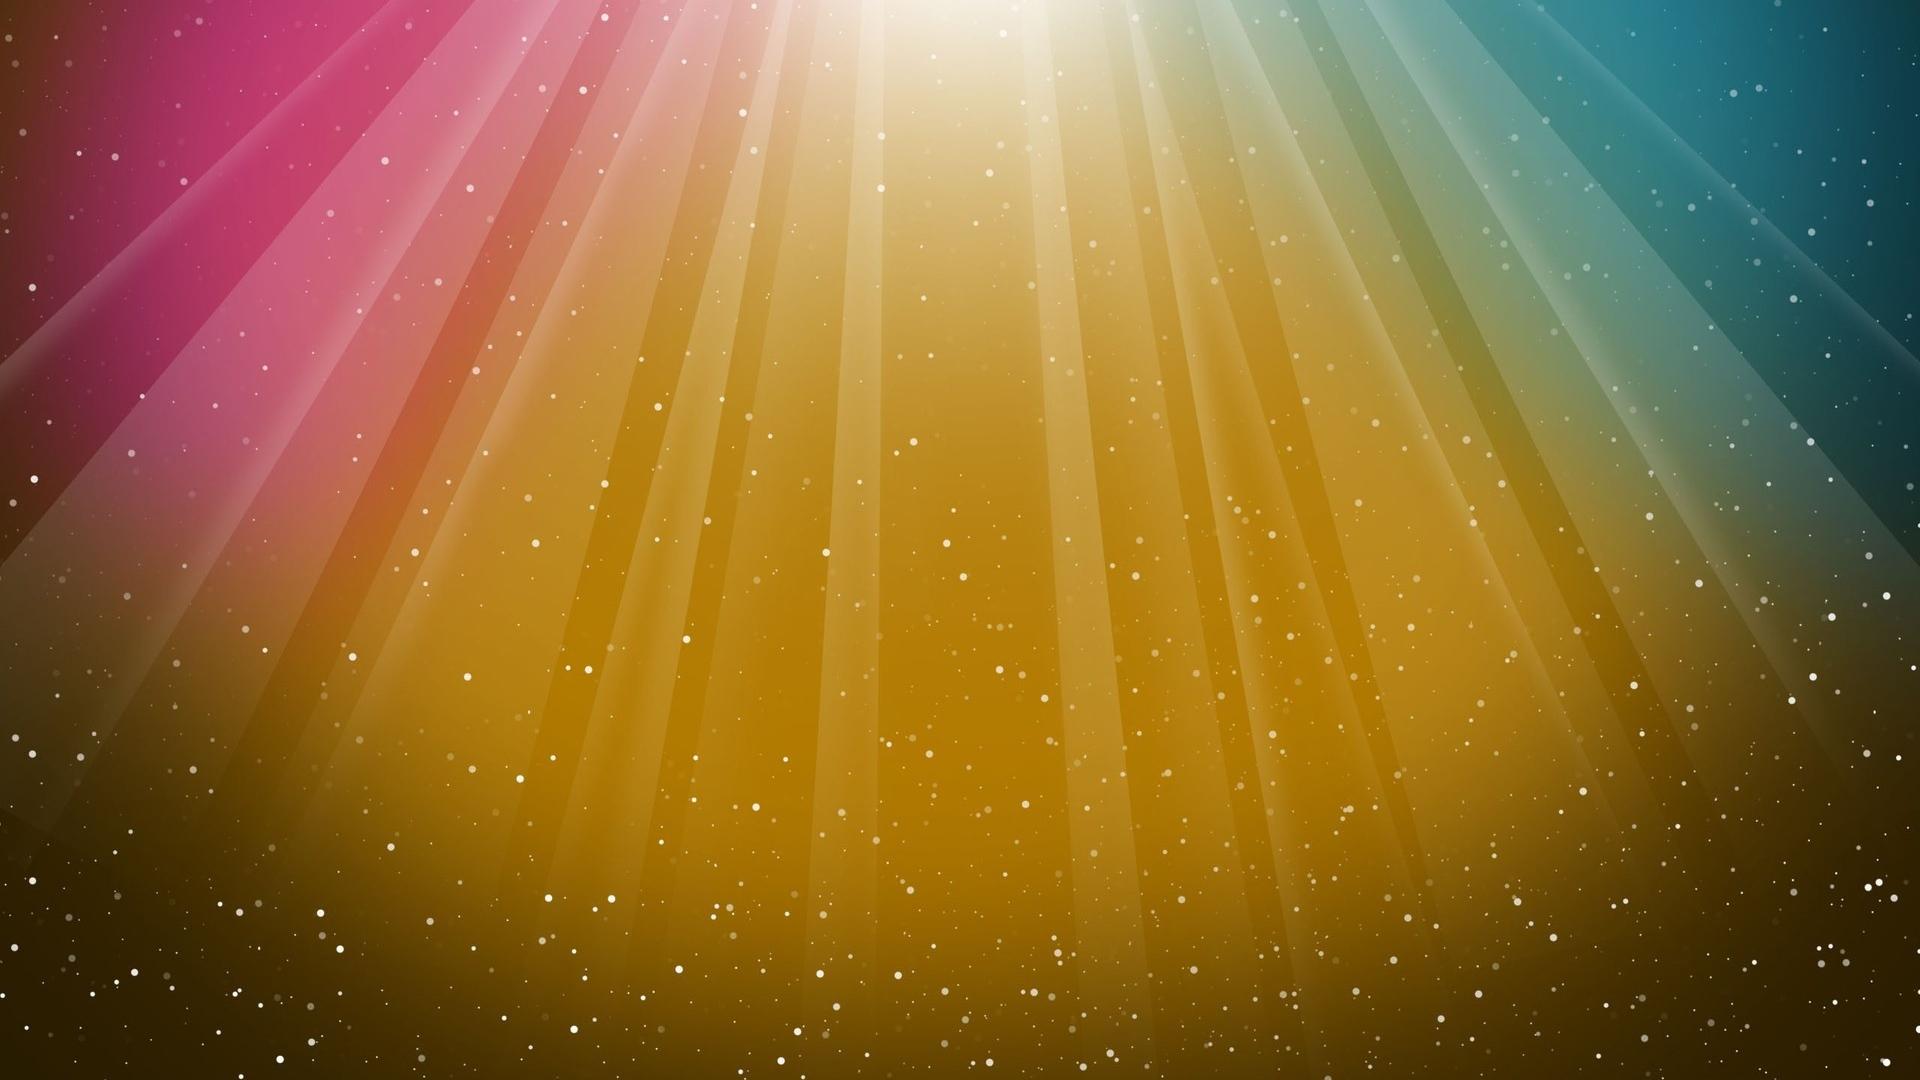 rainbow, colorful, drops